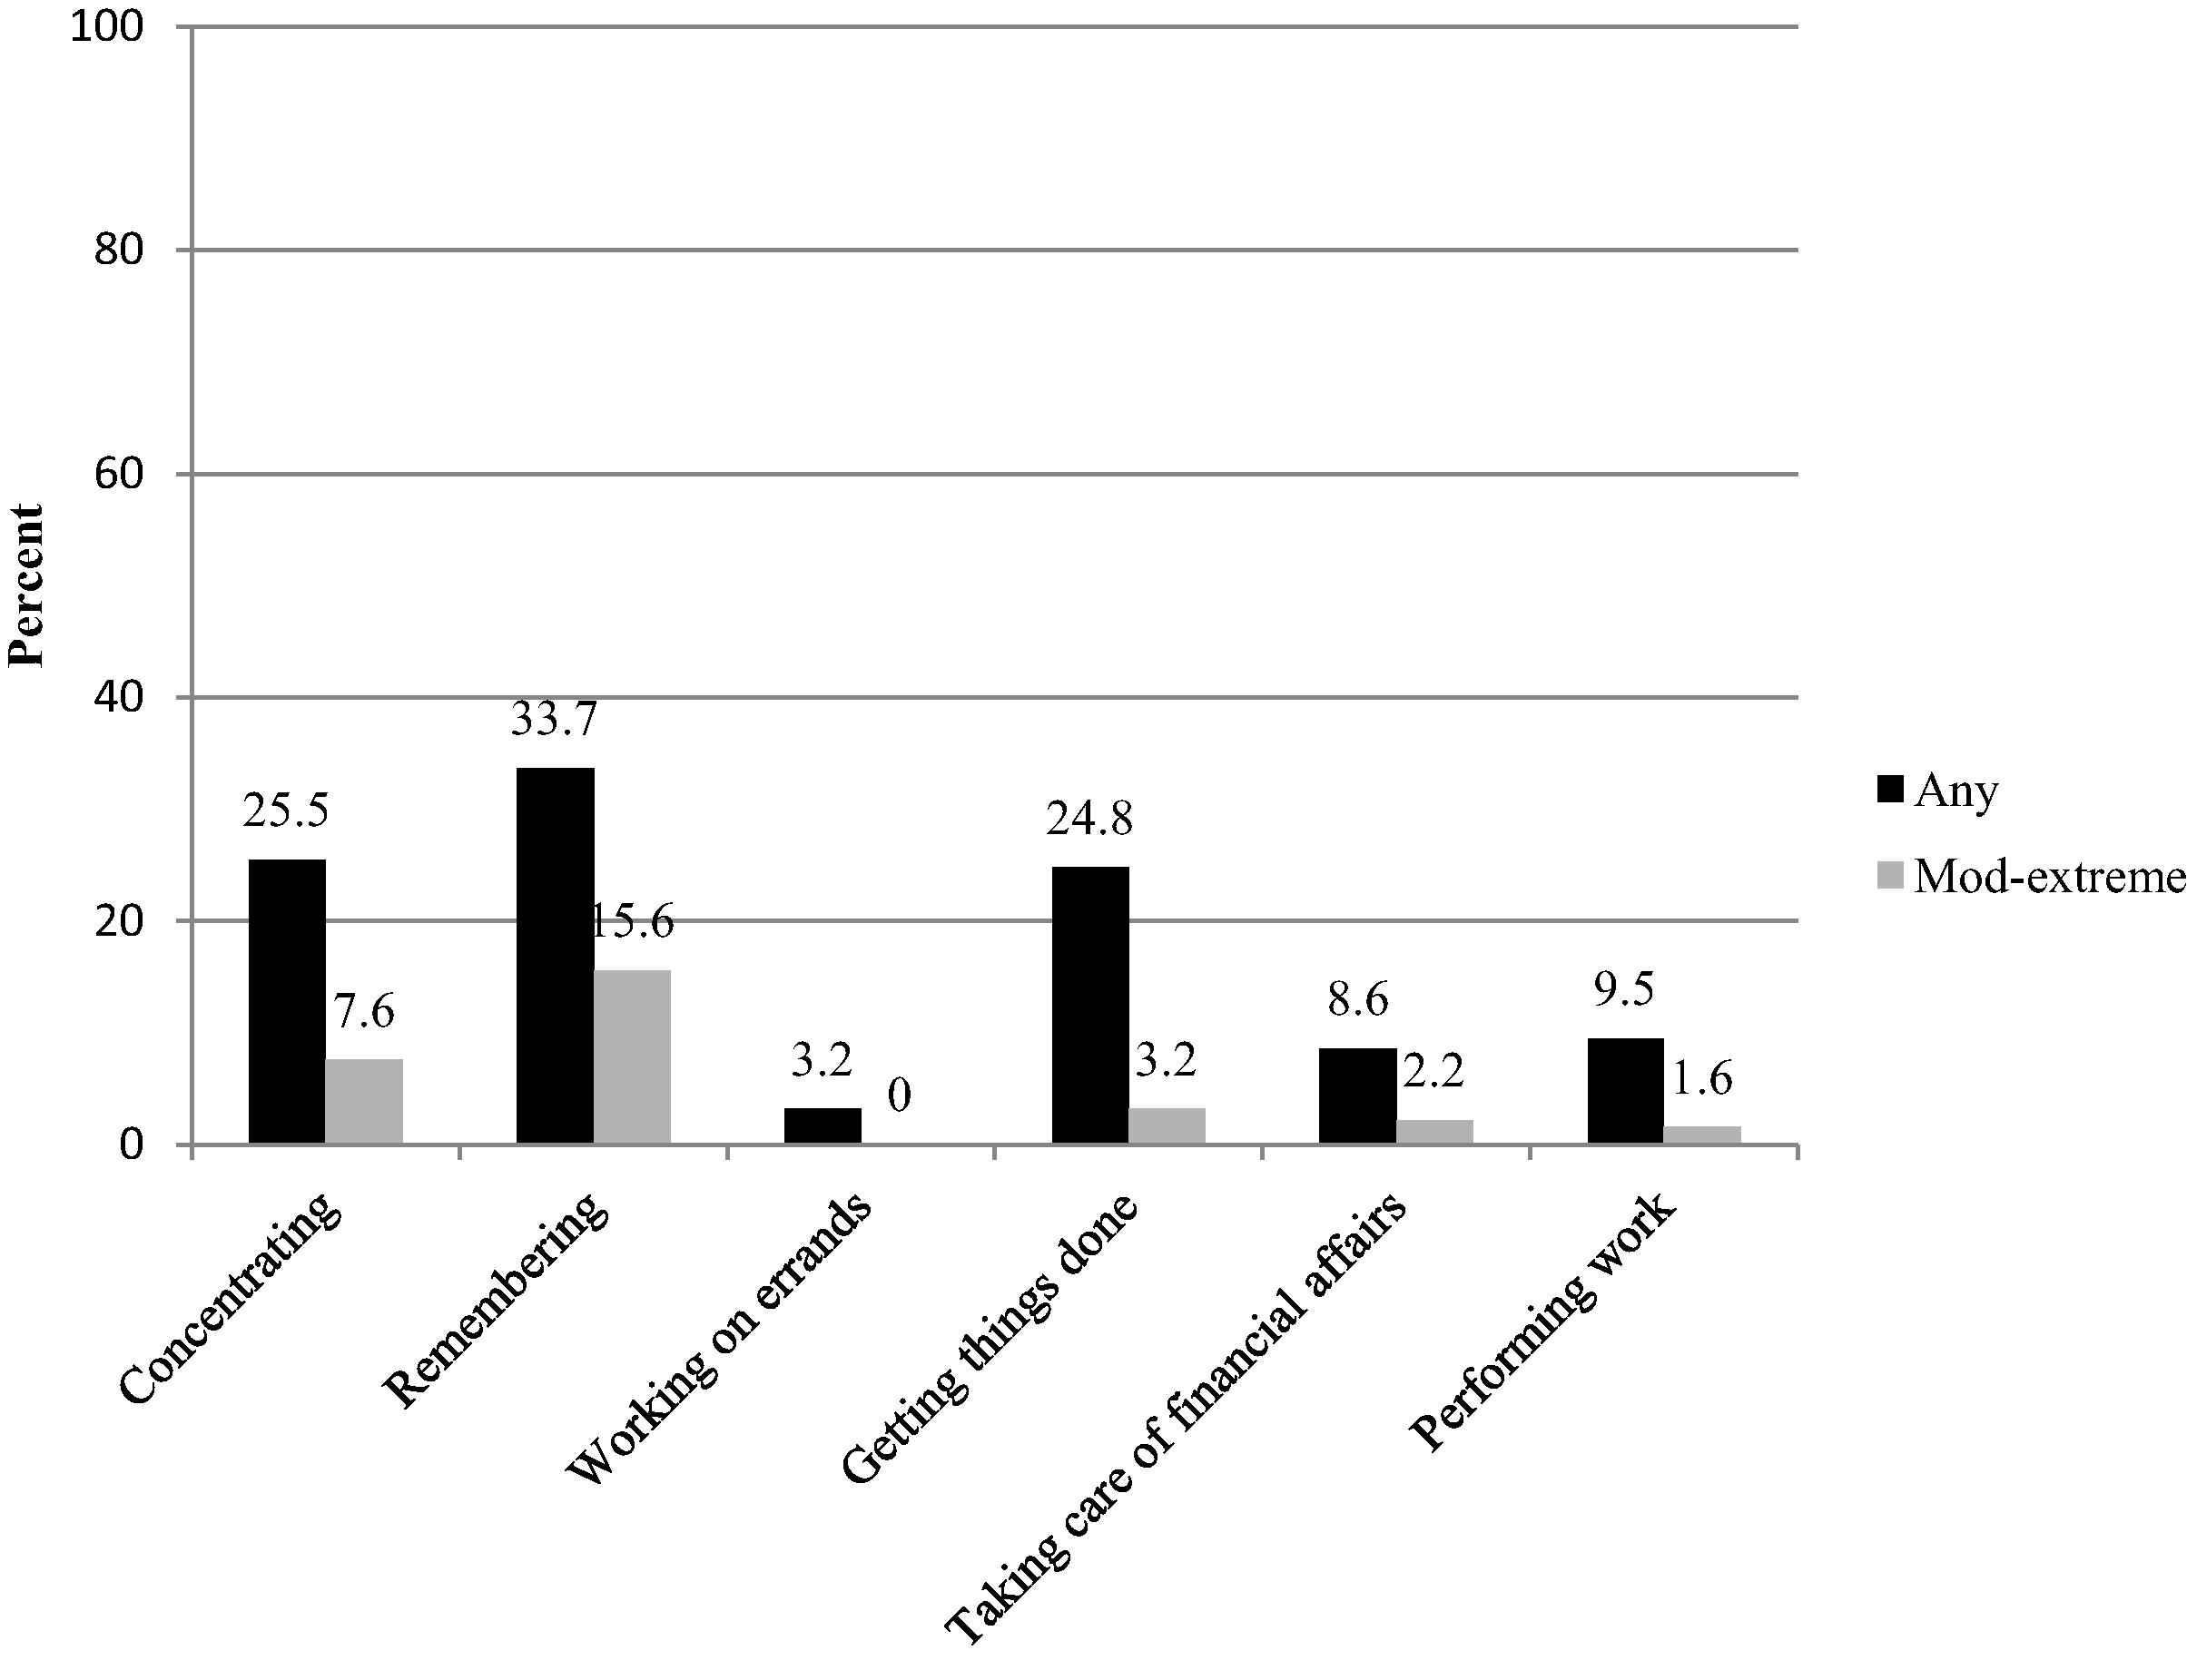 Prevalence of self-reported sleep duration and sleep habits